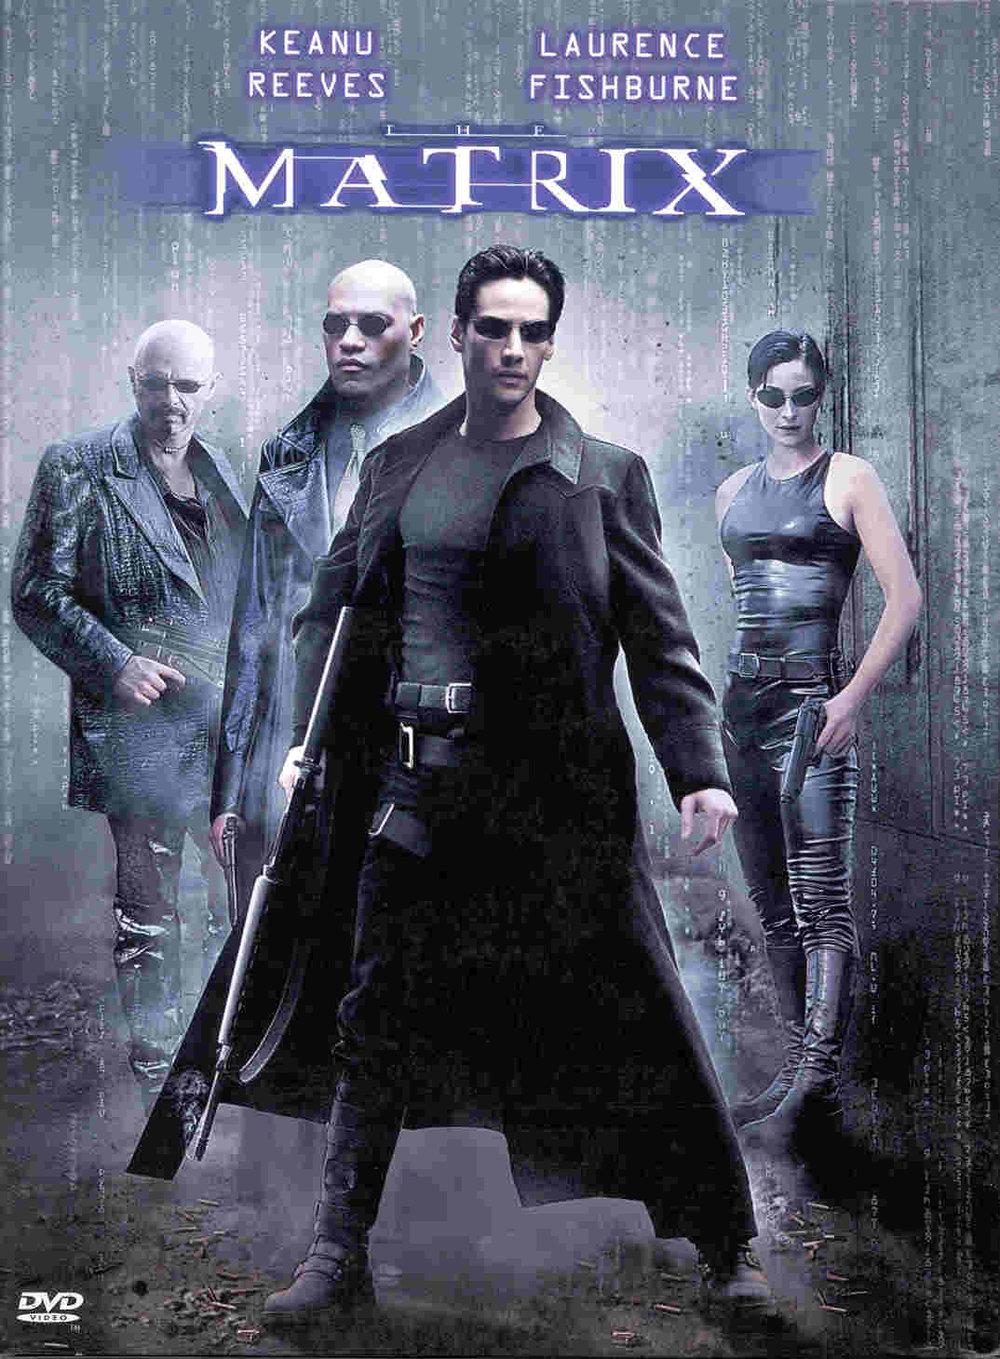 The Matrix film movie poster